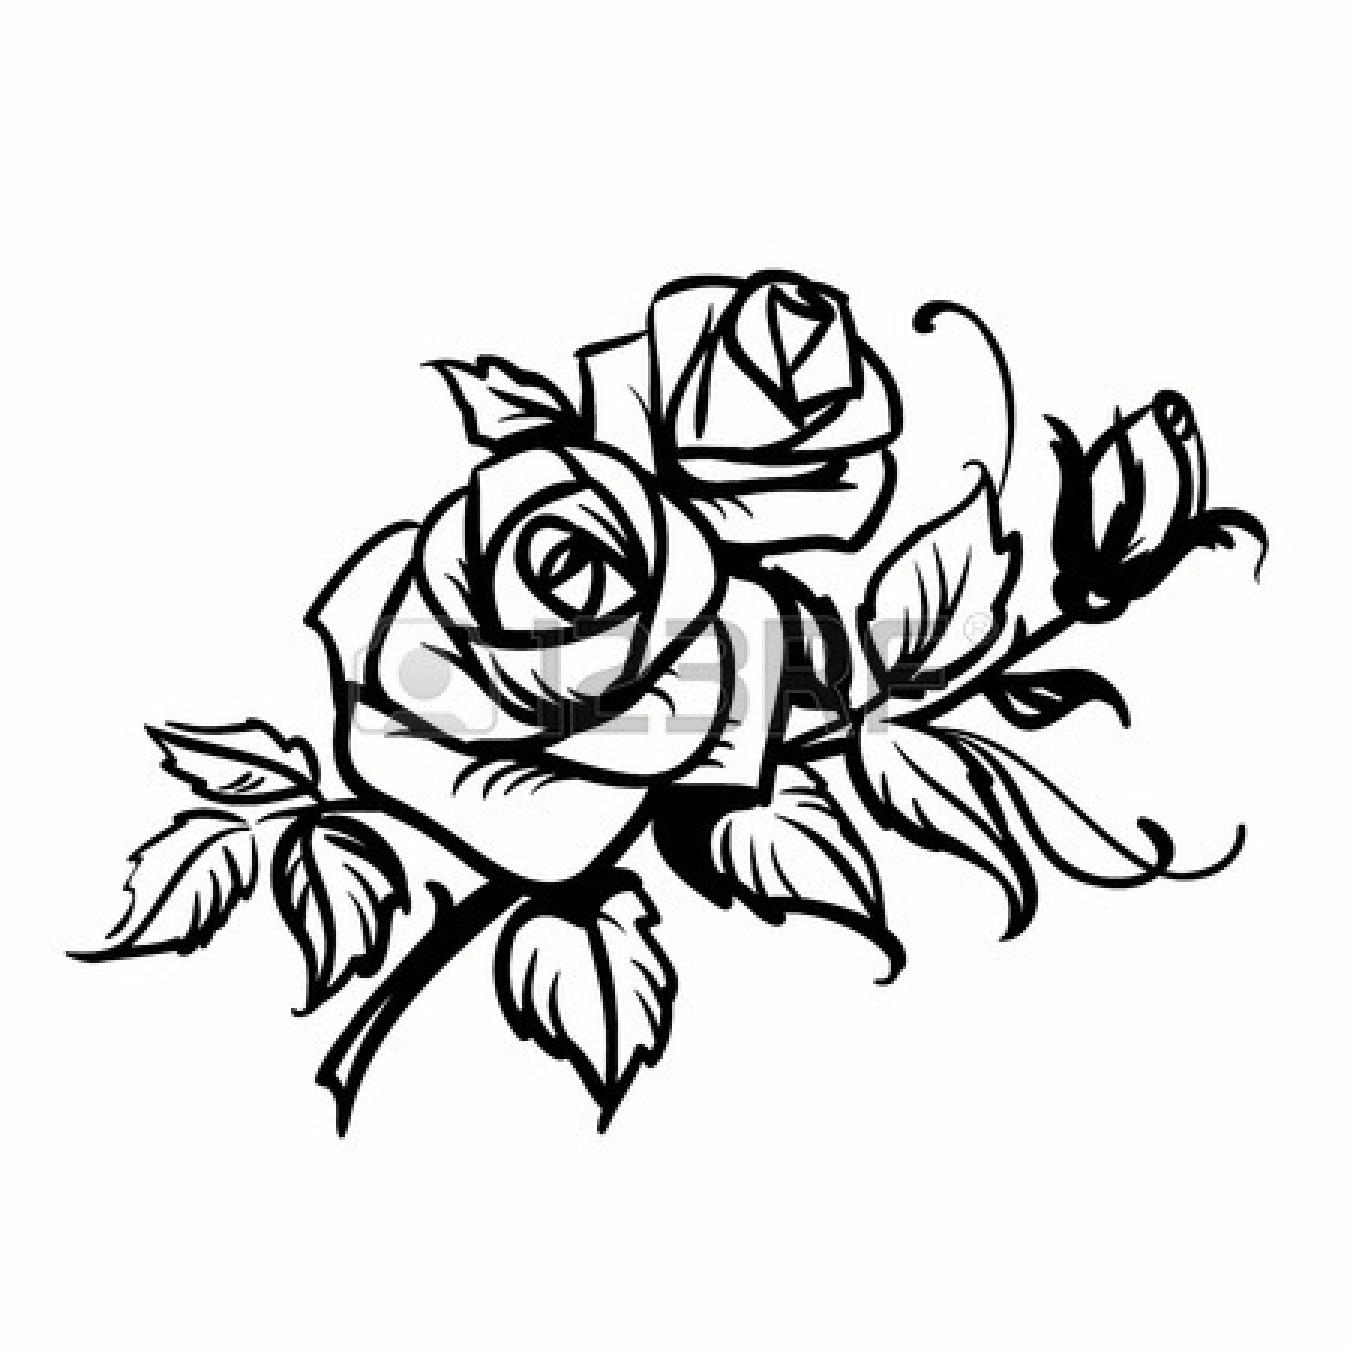 1350x1350 Black Rose Flower Drawing Black Rose Silhouette Clip Art